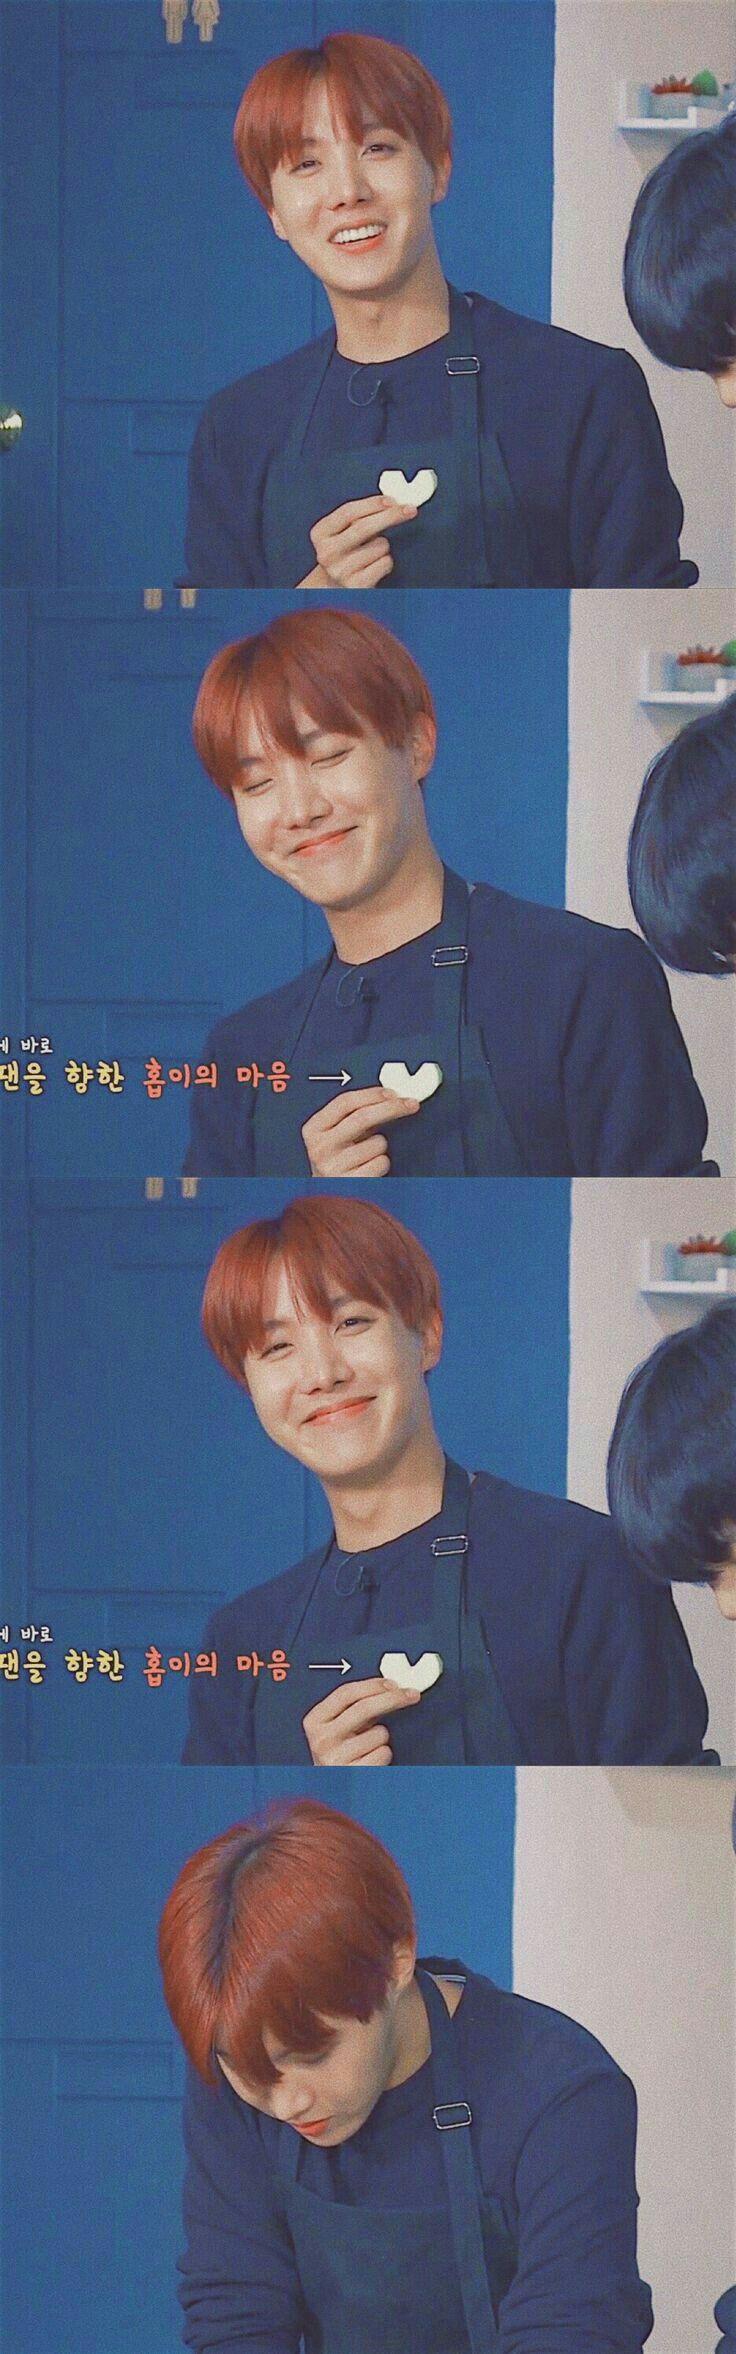 J-Hope and his heart shaped radish. <3 <3 <3